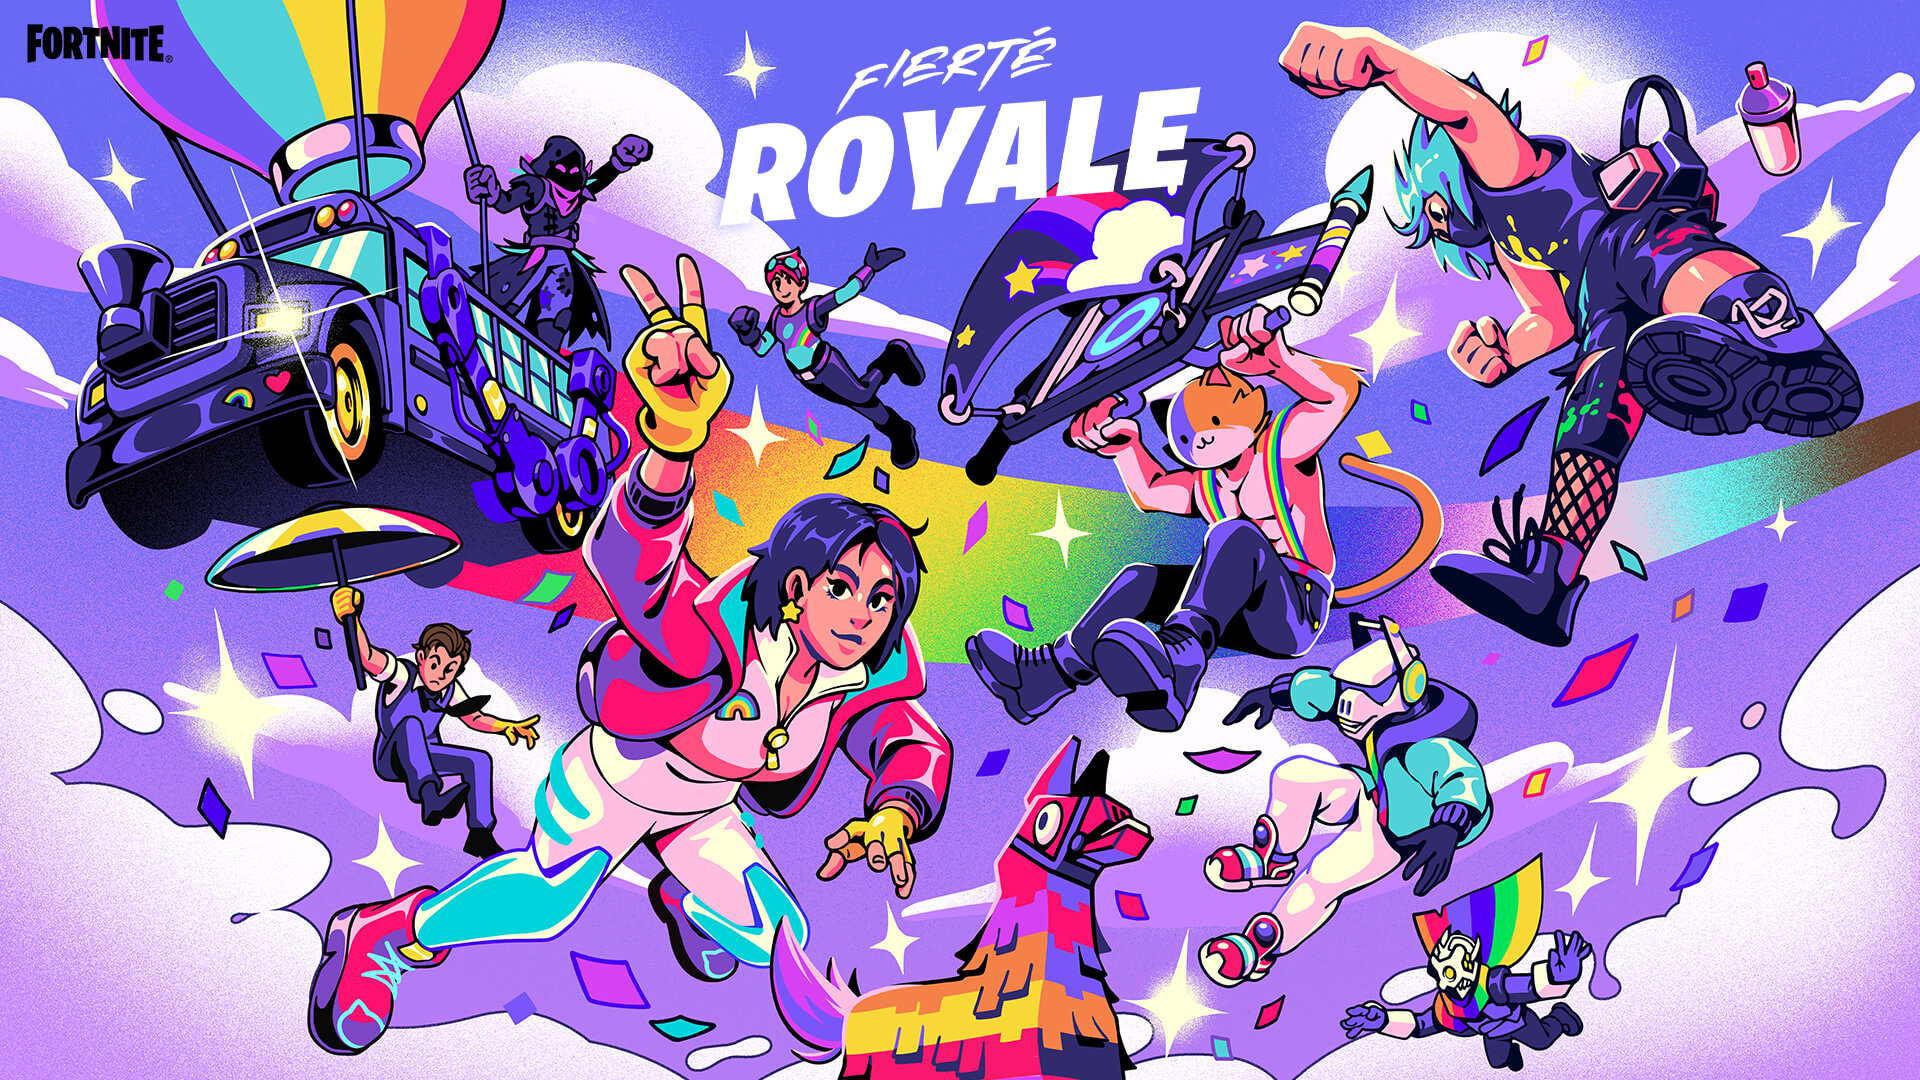 FR 17BR RainbowRoyale KeyArt Social